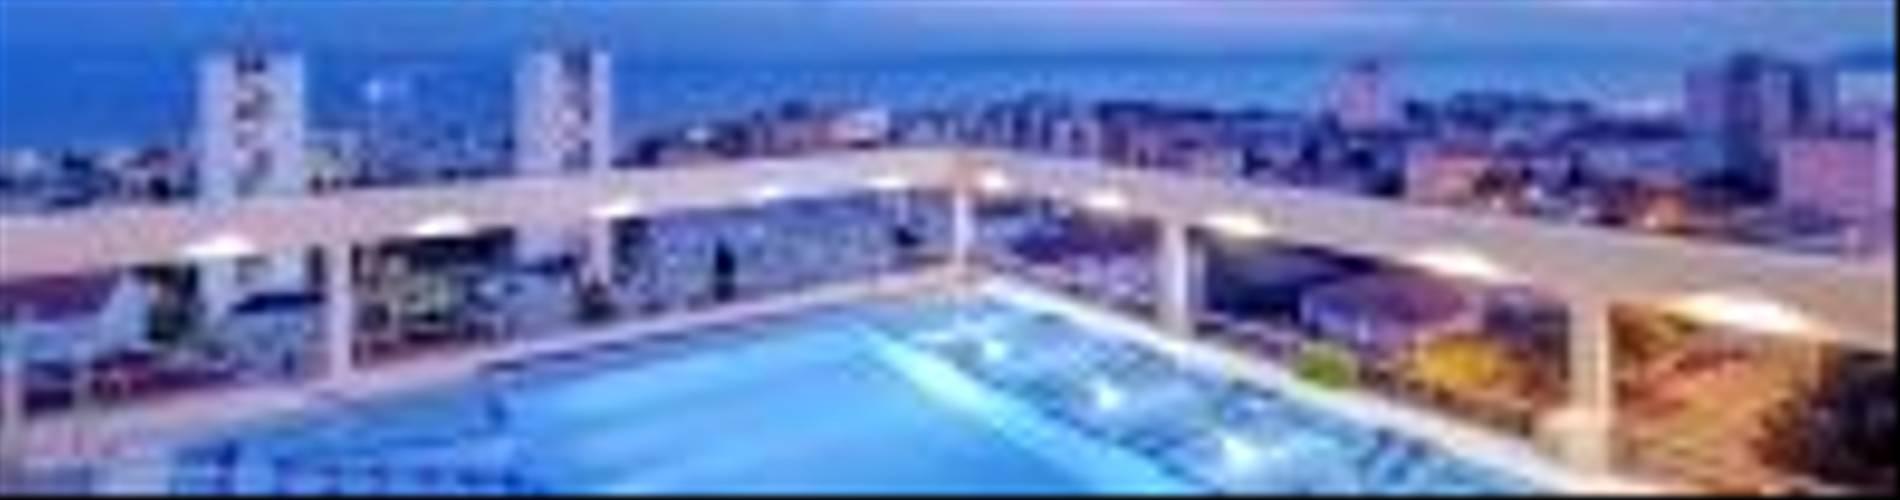 HotelResidence_DIOKLECIJAN_rooftop-pool-night-panorama-vertical_2048px_5D3A2706-198x120.jpg